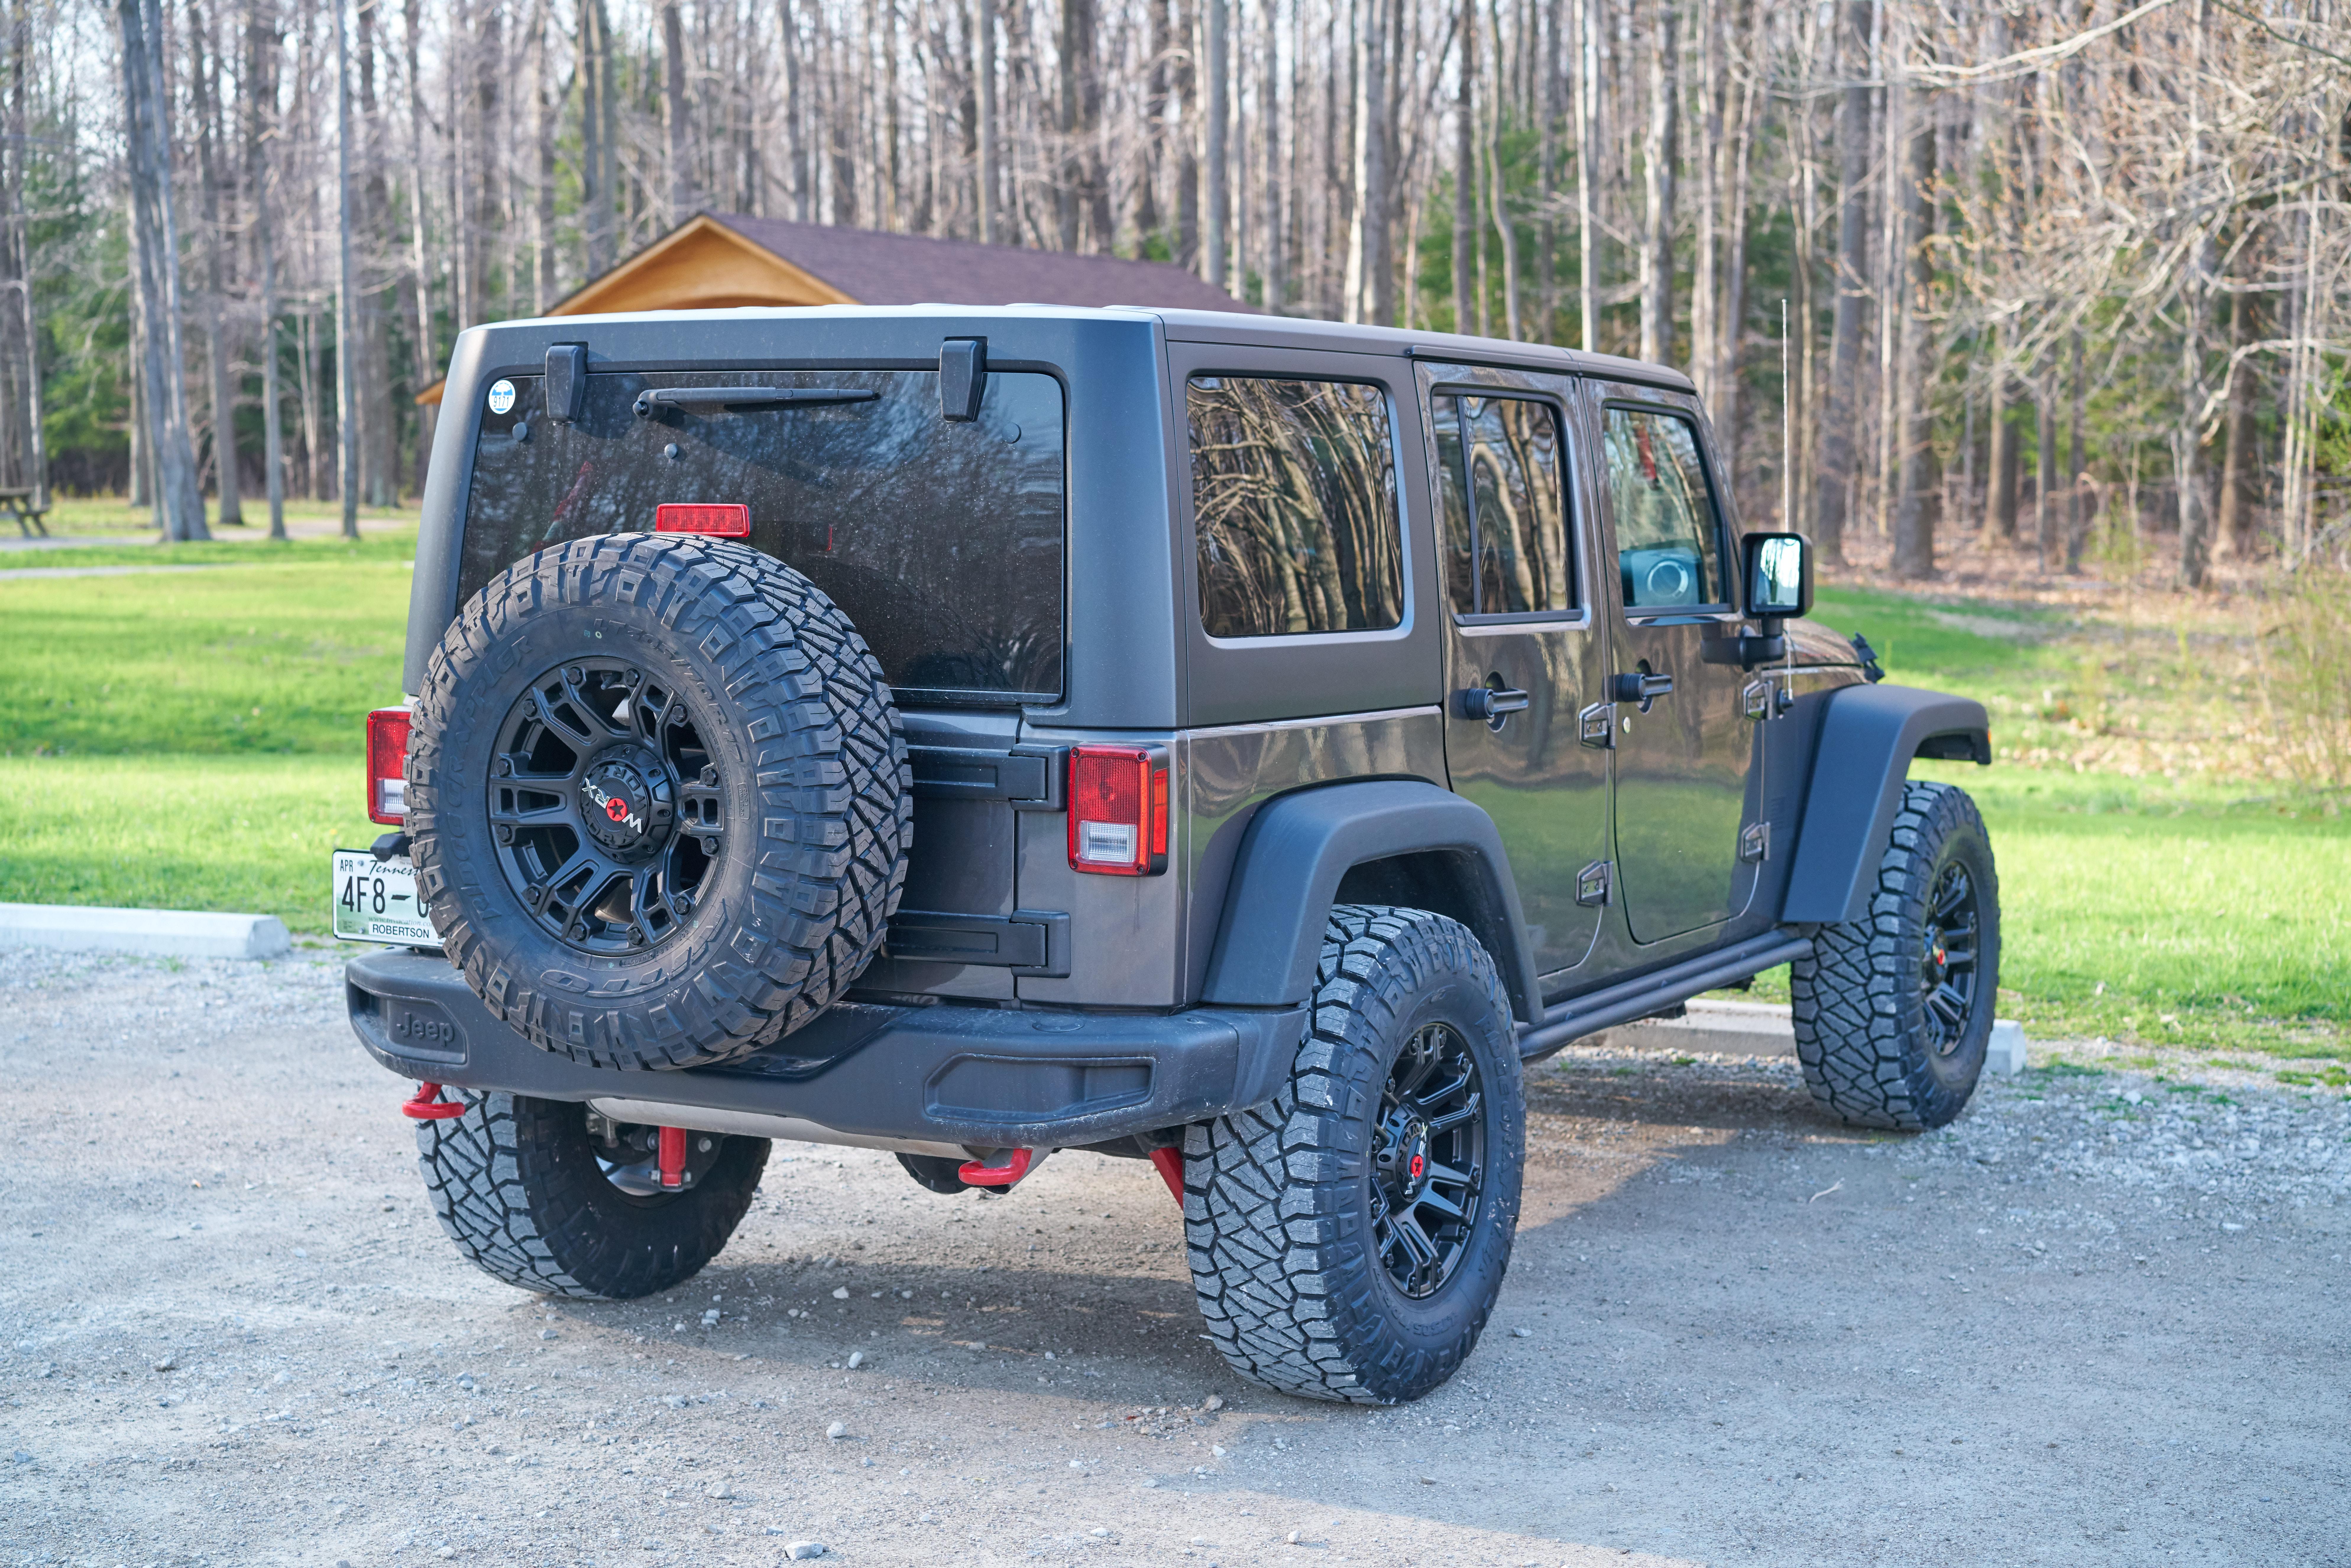 Jeep Jk 3. Tires >> ridge grappler vs ko2 - JKowners.com : Jeep Wrangler JK Forum